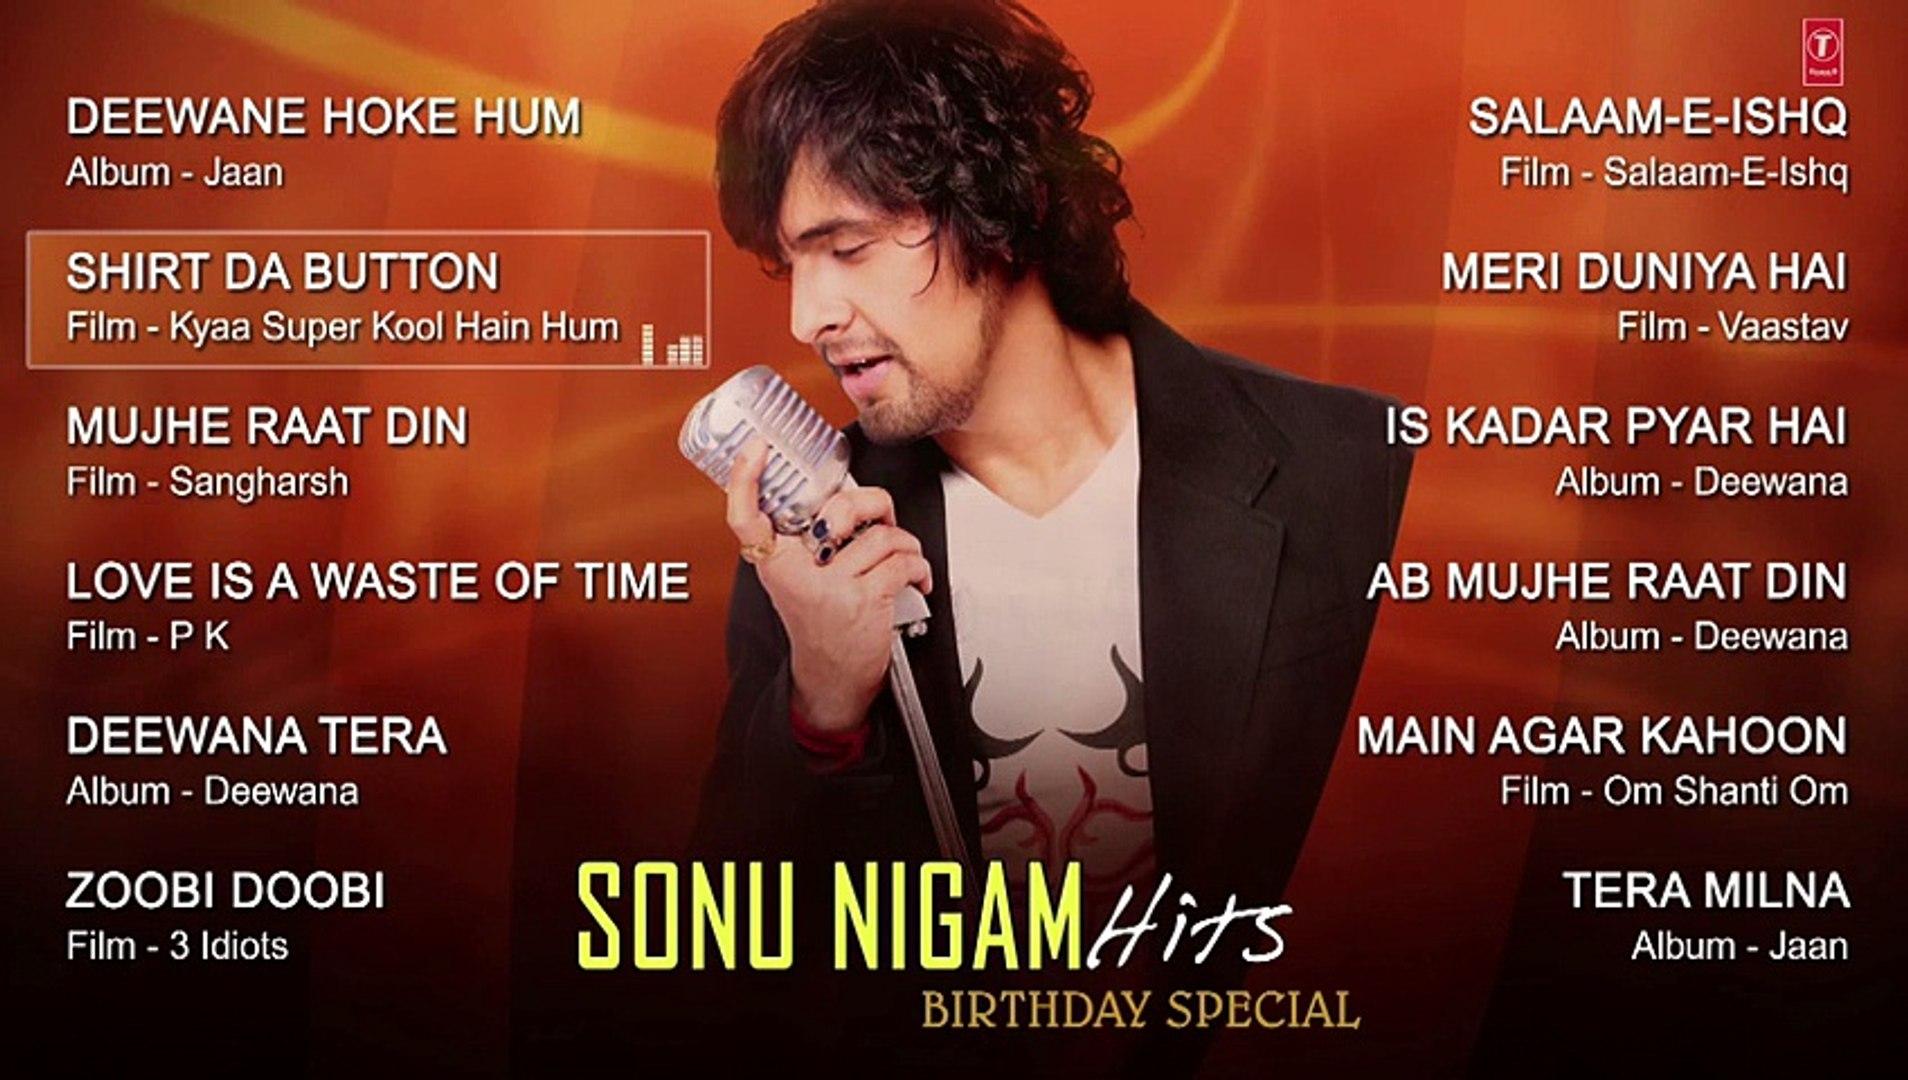 Sonu Nigam Romantic Songs Collection JUKEBOX - Deewana Tera, Mujhe Raat Din  - T-Series